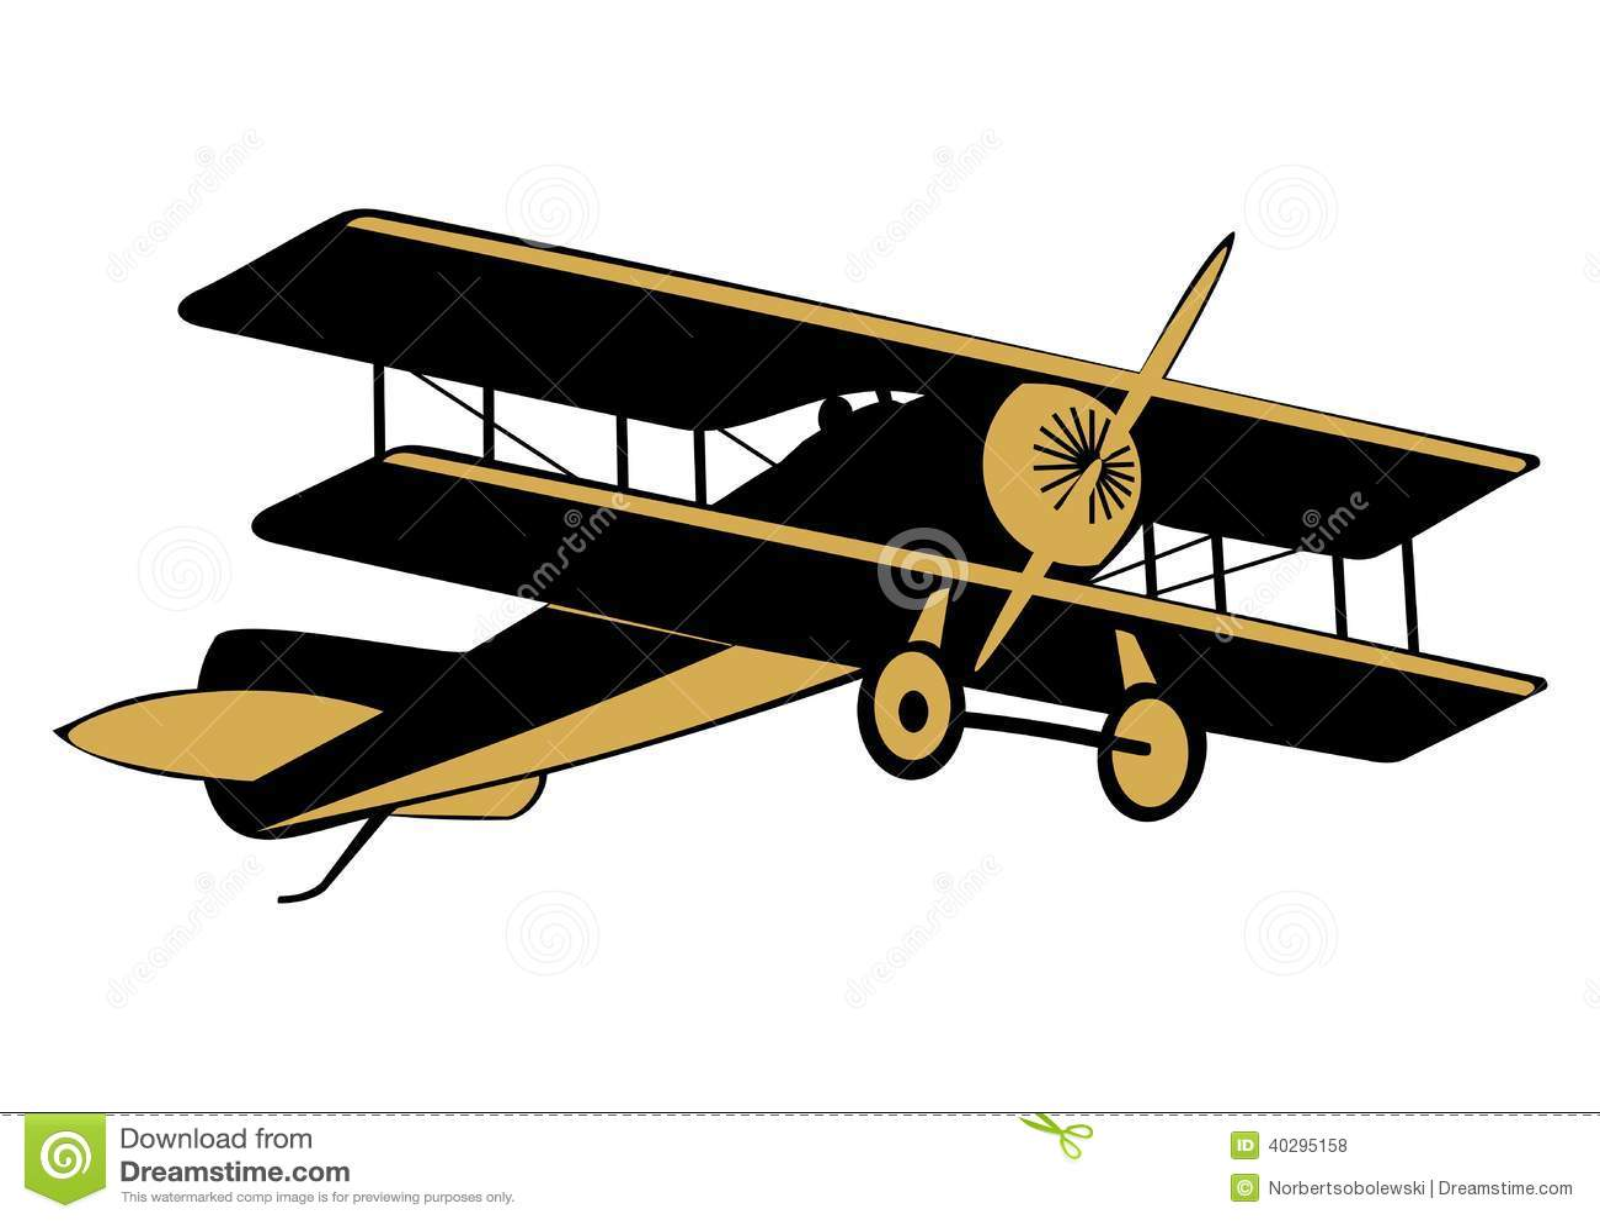 airplane stock vector illustration of fighter antique 40295158 rh dreamstime com